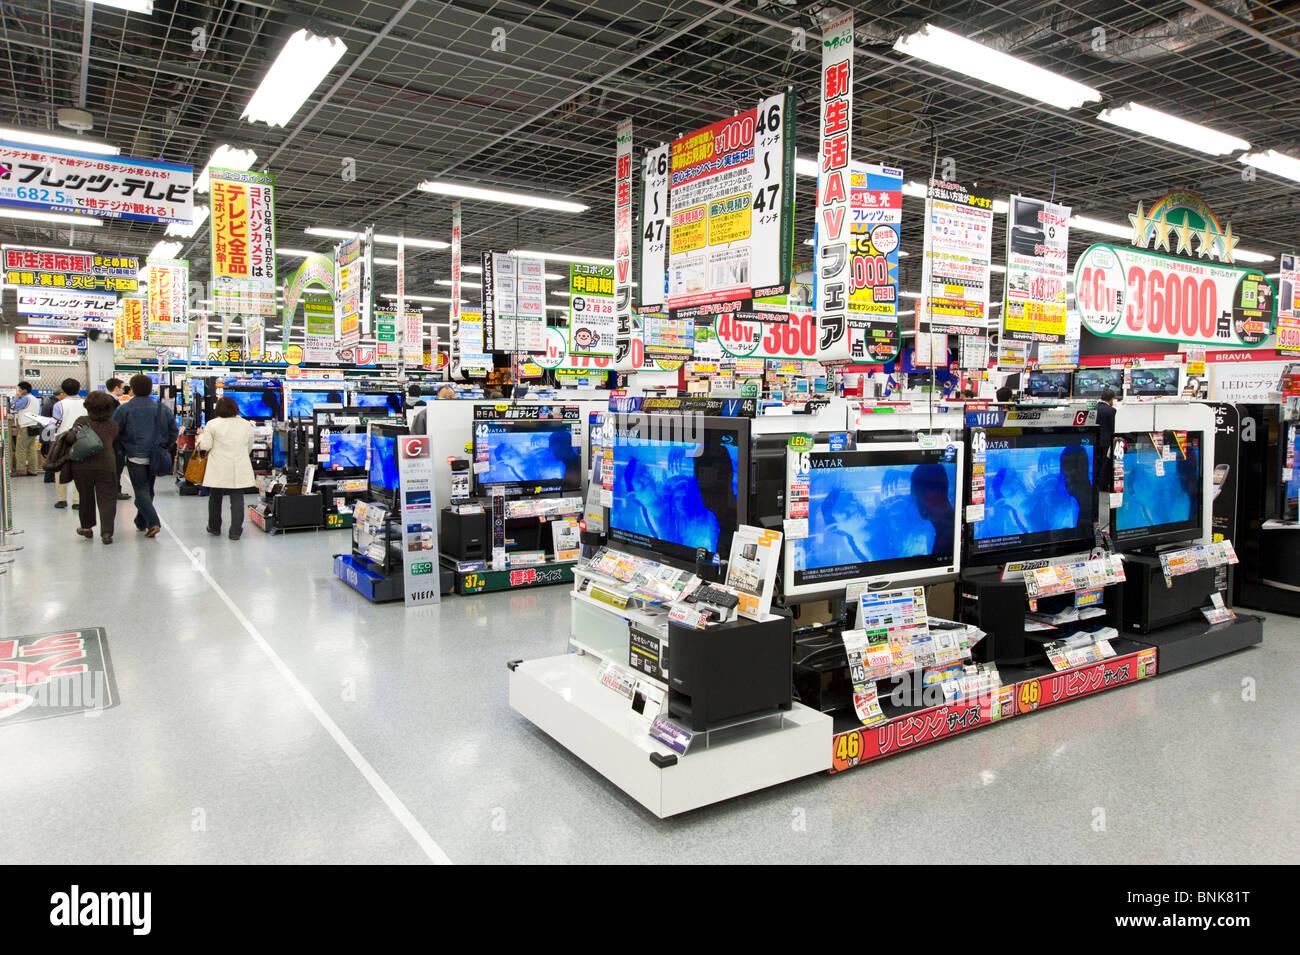 Huge consumer electronics store, Yodobashi Akiba in Akihabara Stock Photo - Alamy